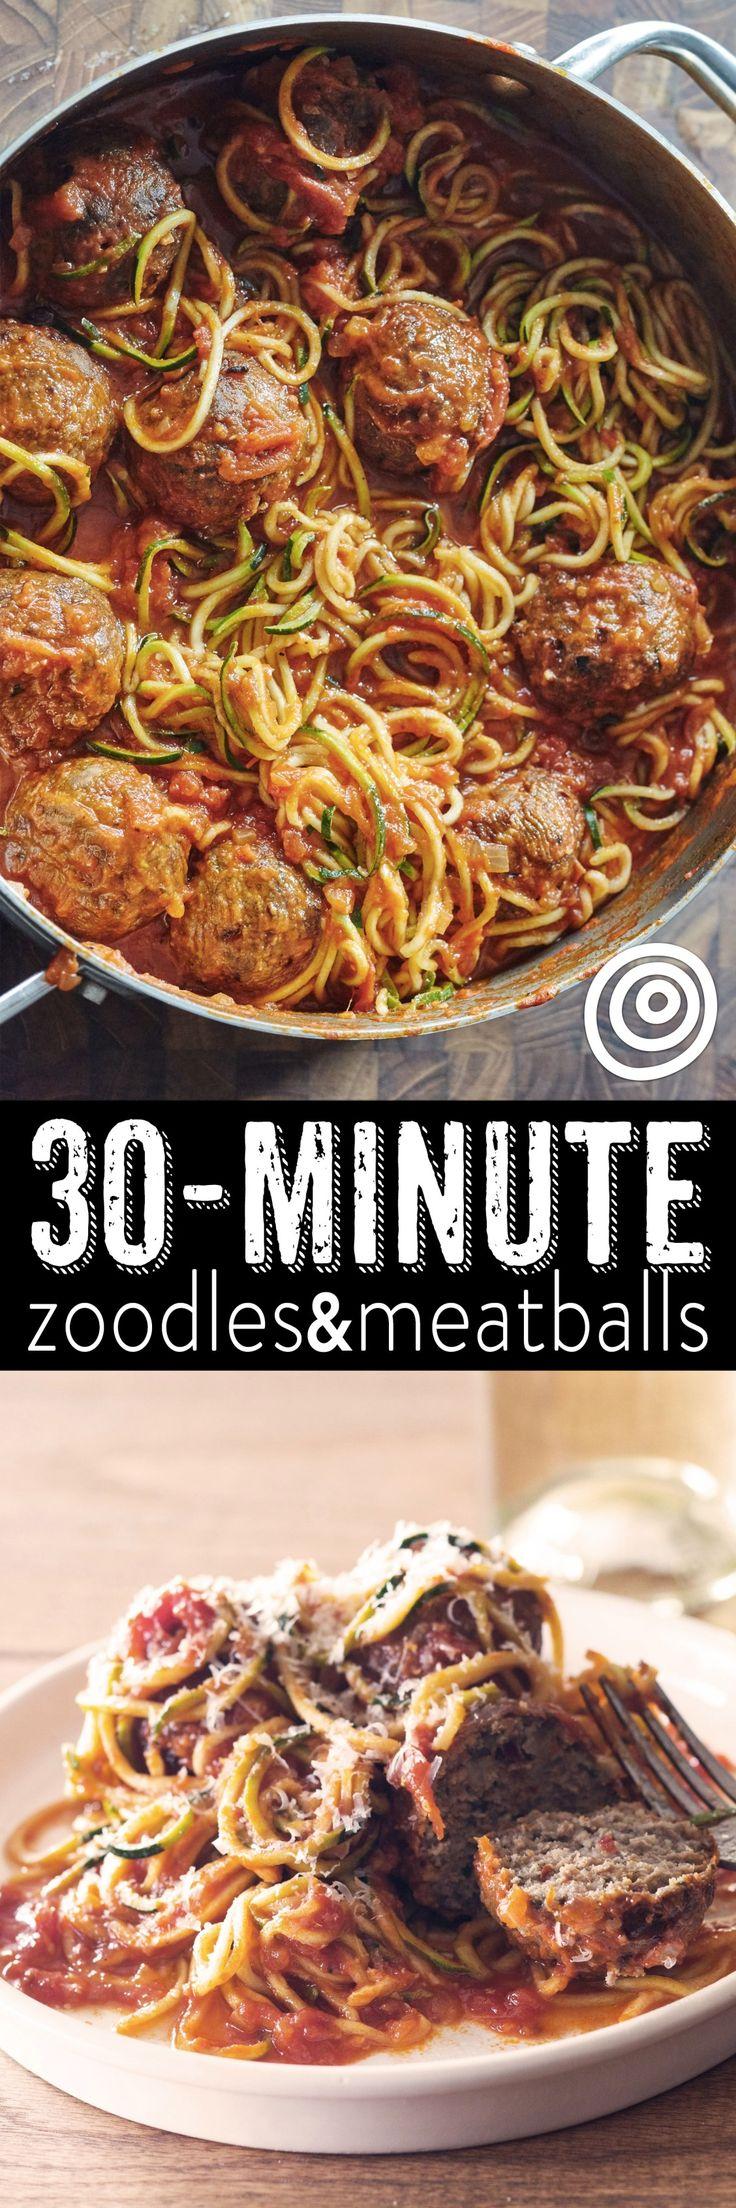 Best 25+ Zucchini spaghetti ideas on Pinterest | Zuchinni ...